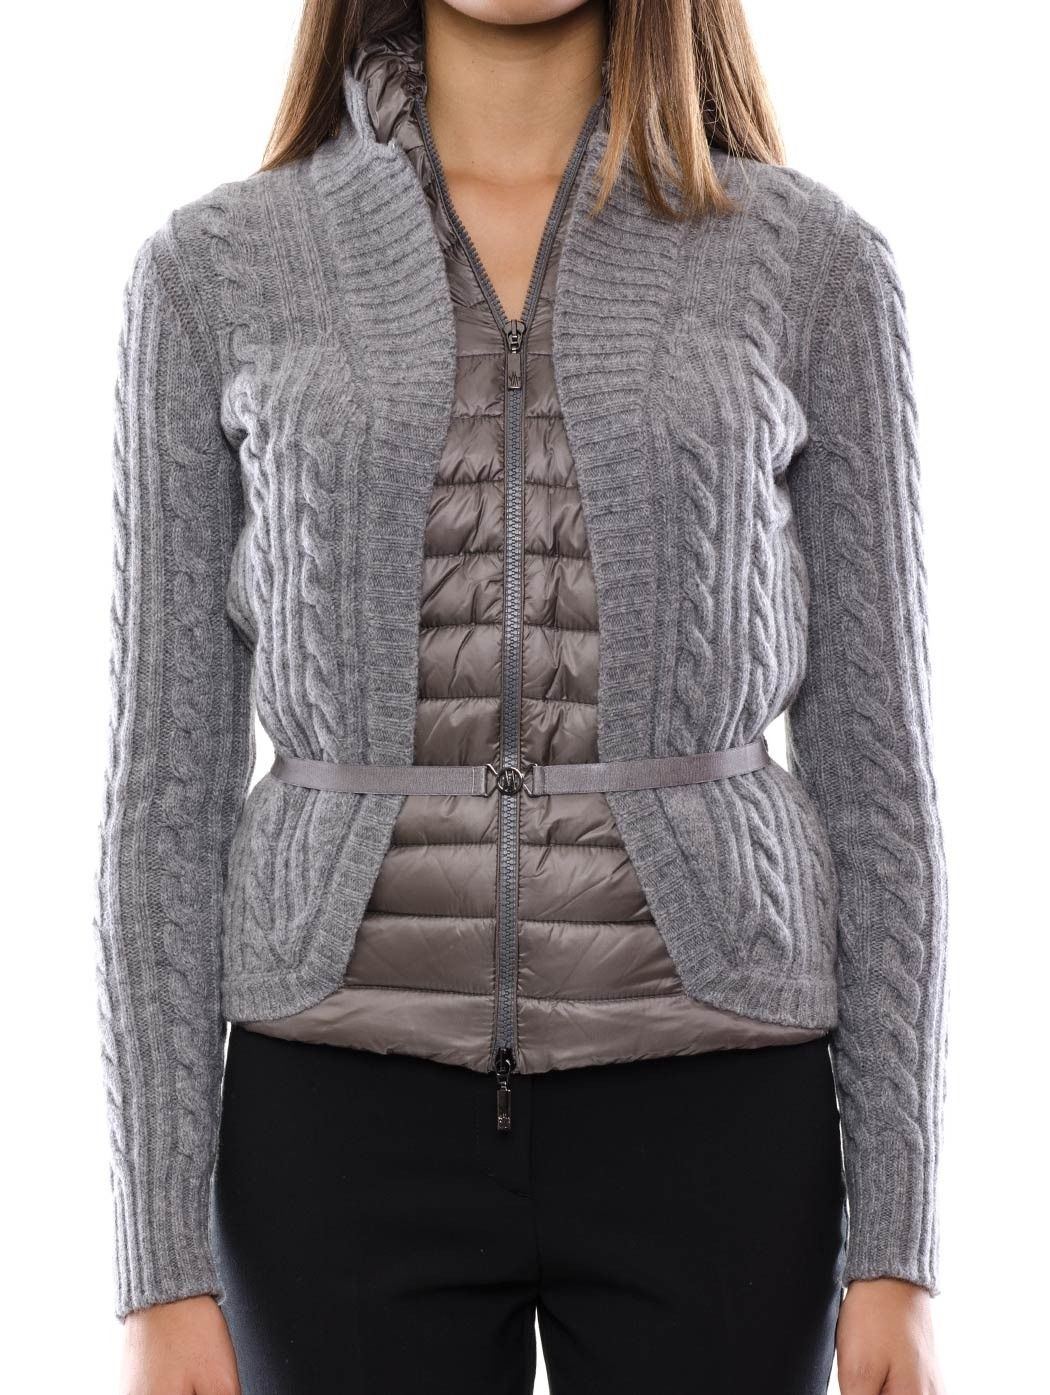 Moncler FW 2014 #fashion #moda #sale #saldi #shopping #fw #denim #woman http://www.chirullishop.com/it/8-nuove-collezioni-ai#/designer-moncler